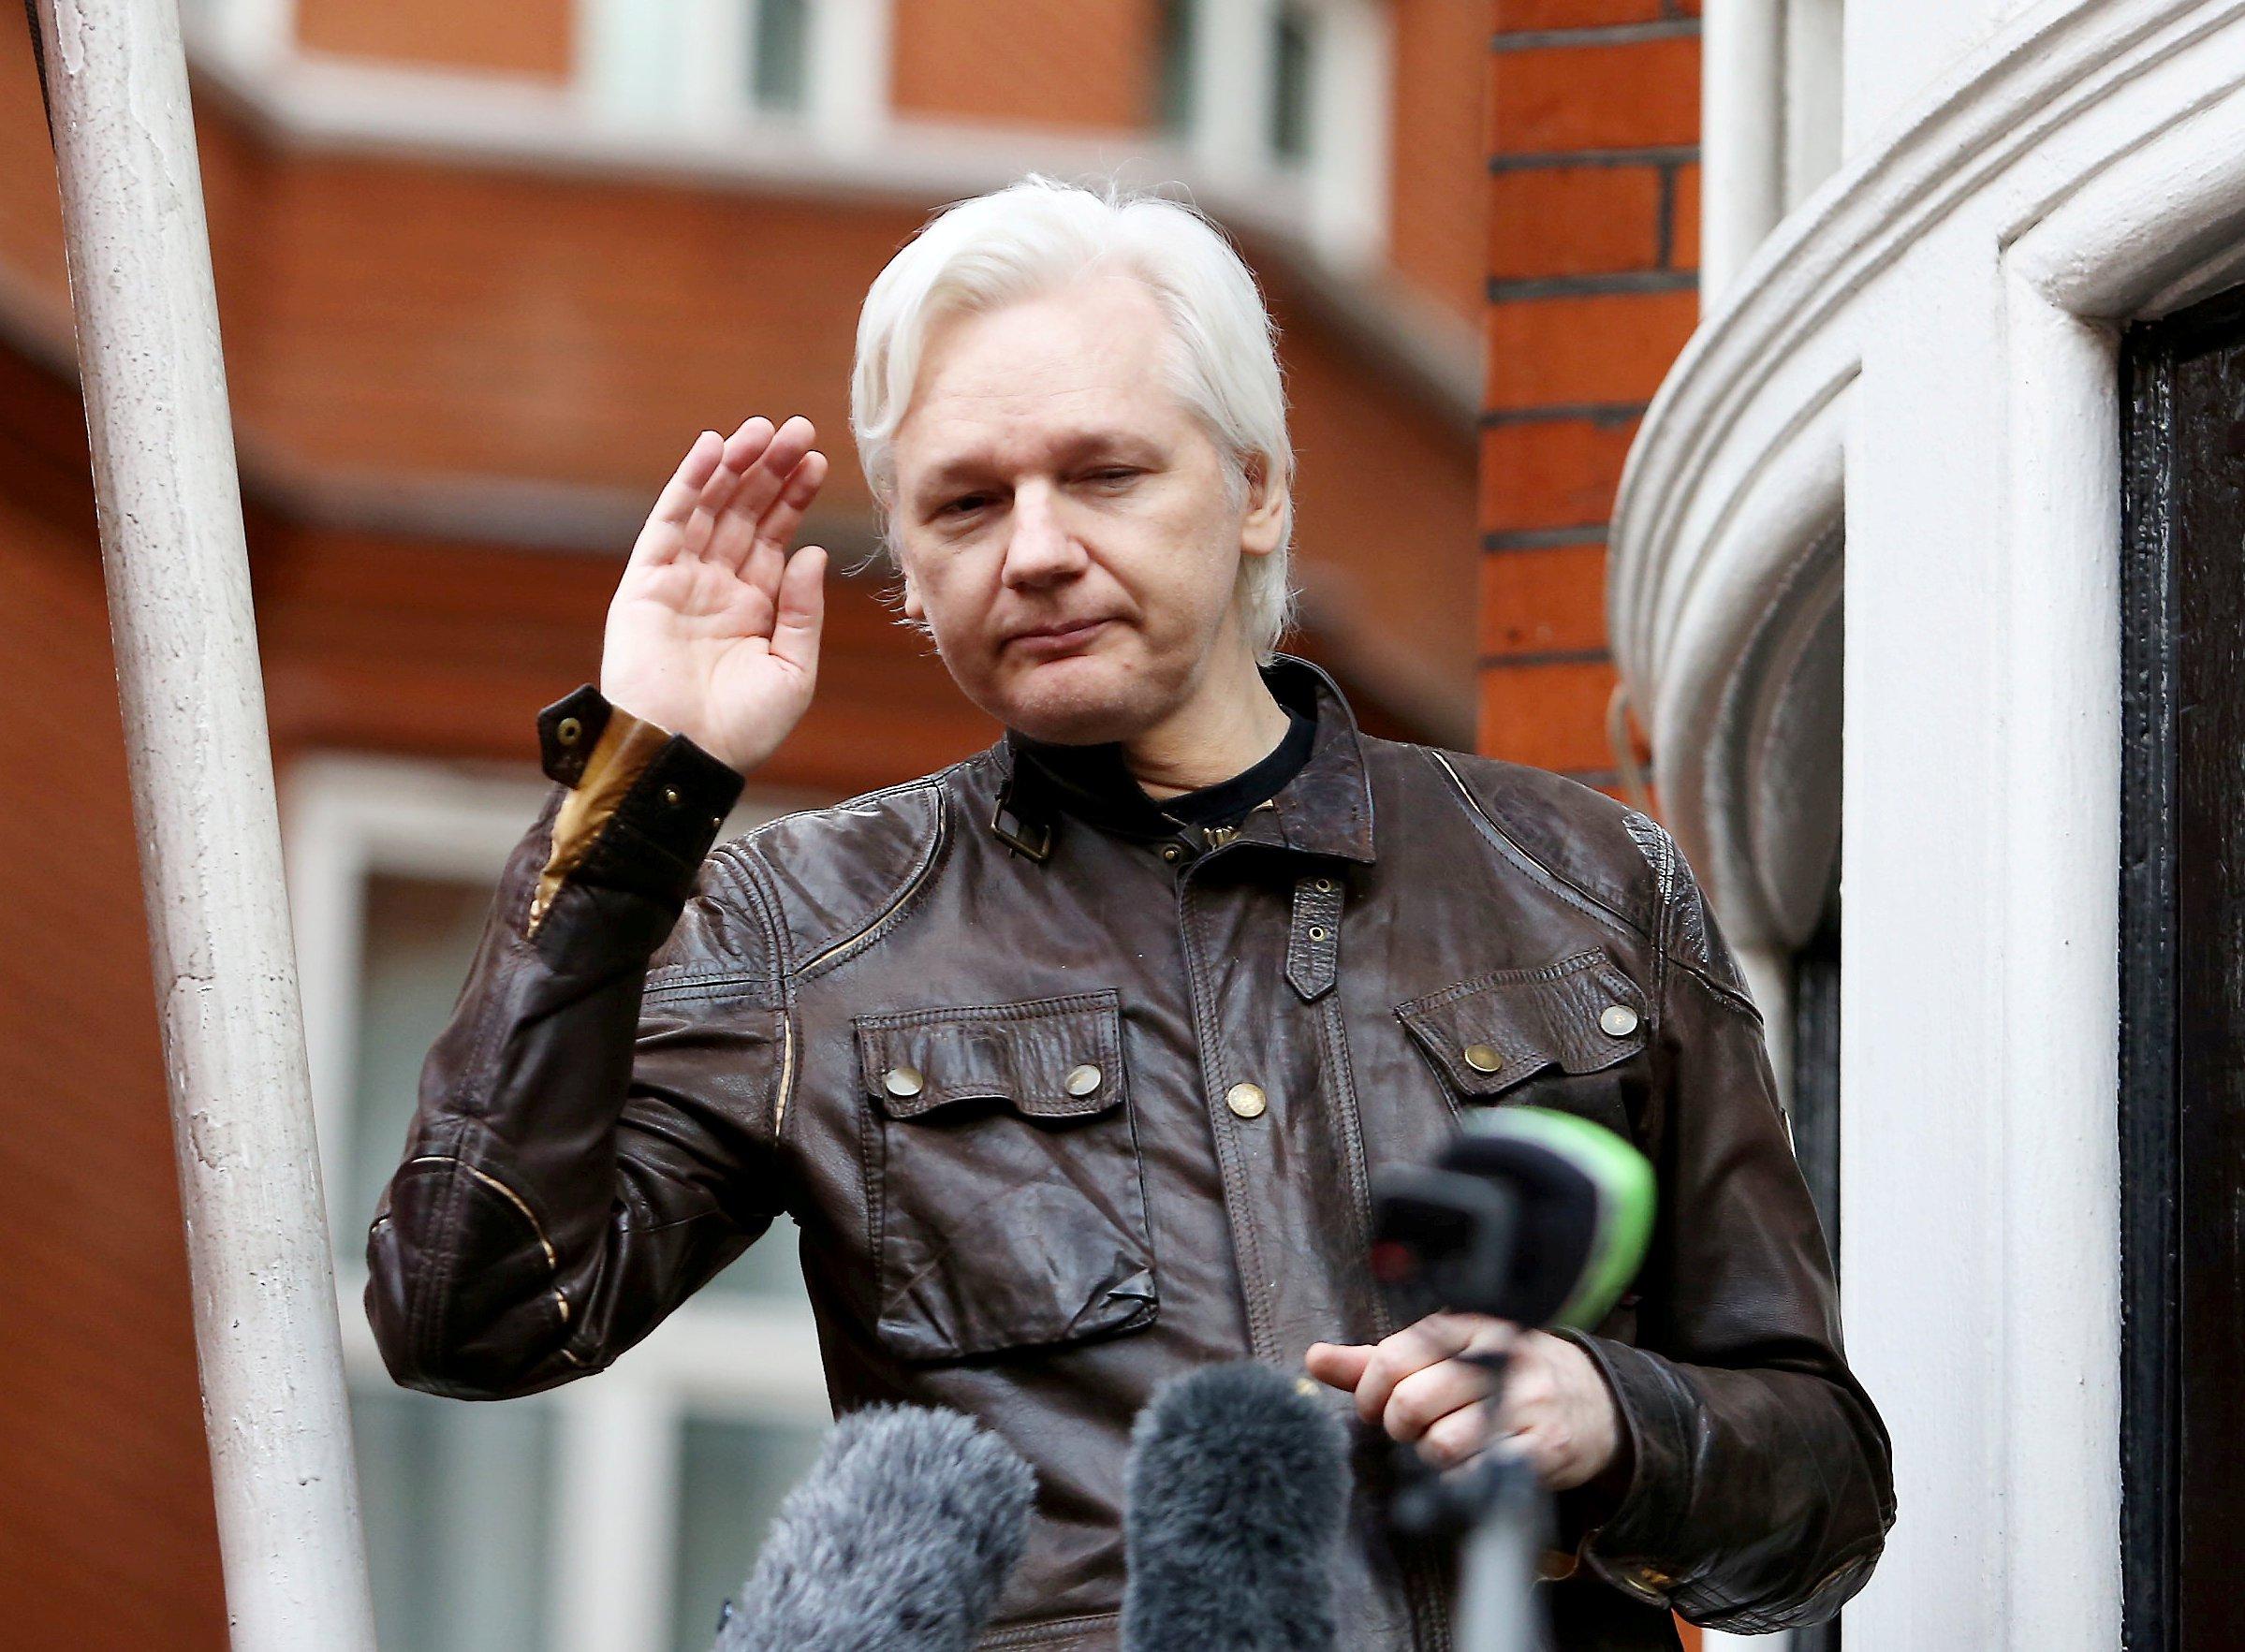 Julian Assange U0026 39 Smeared Poo Over Embassy Walls U0026 39 Says